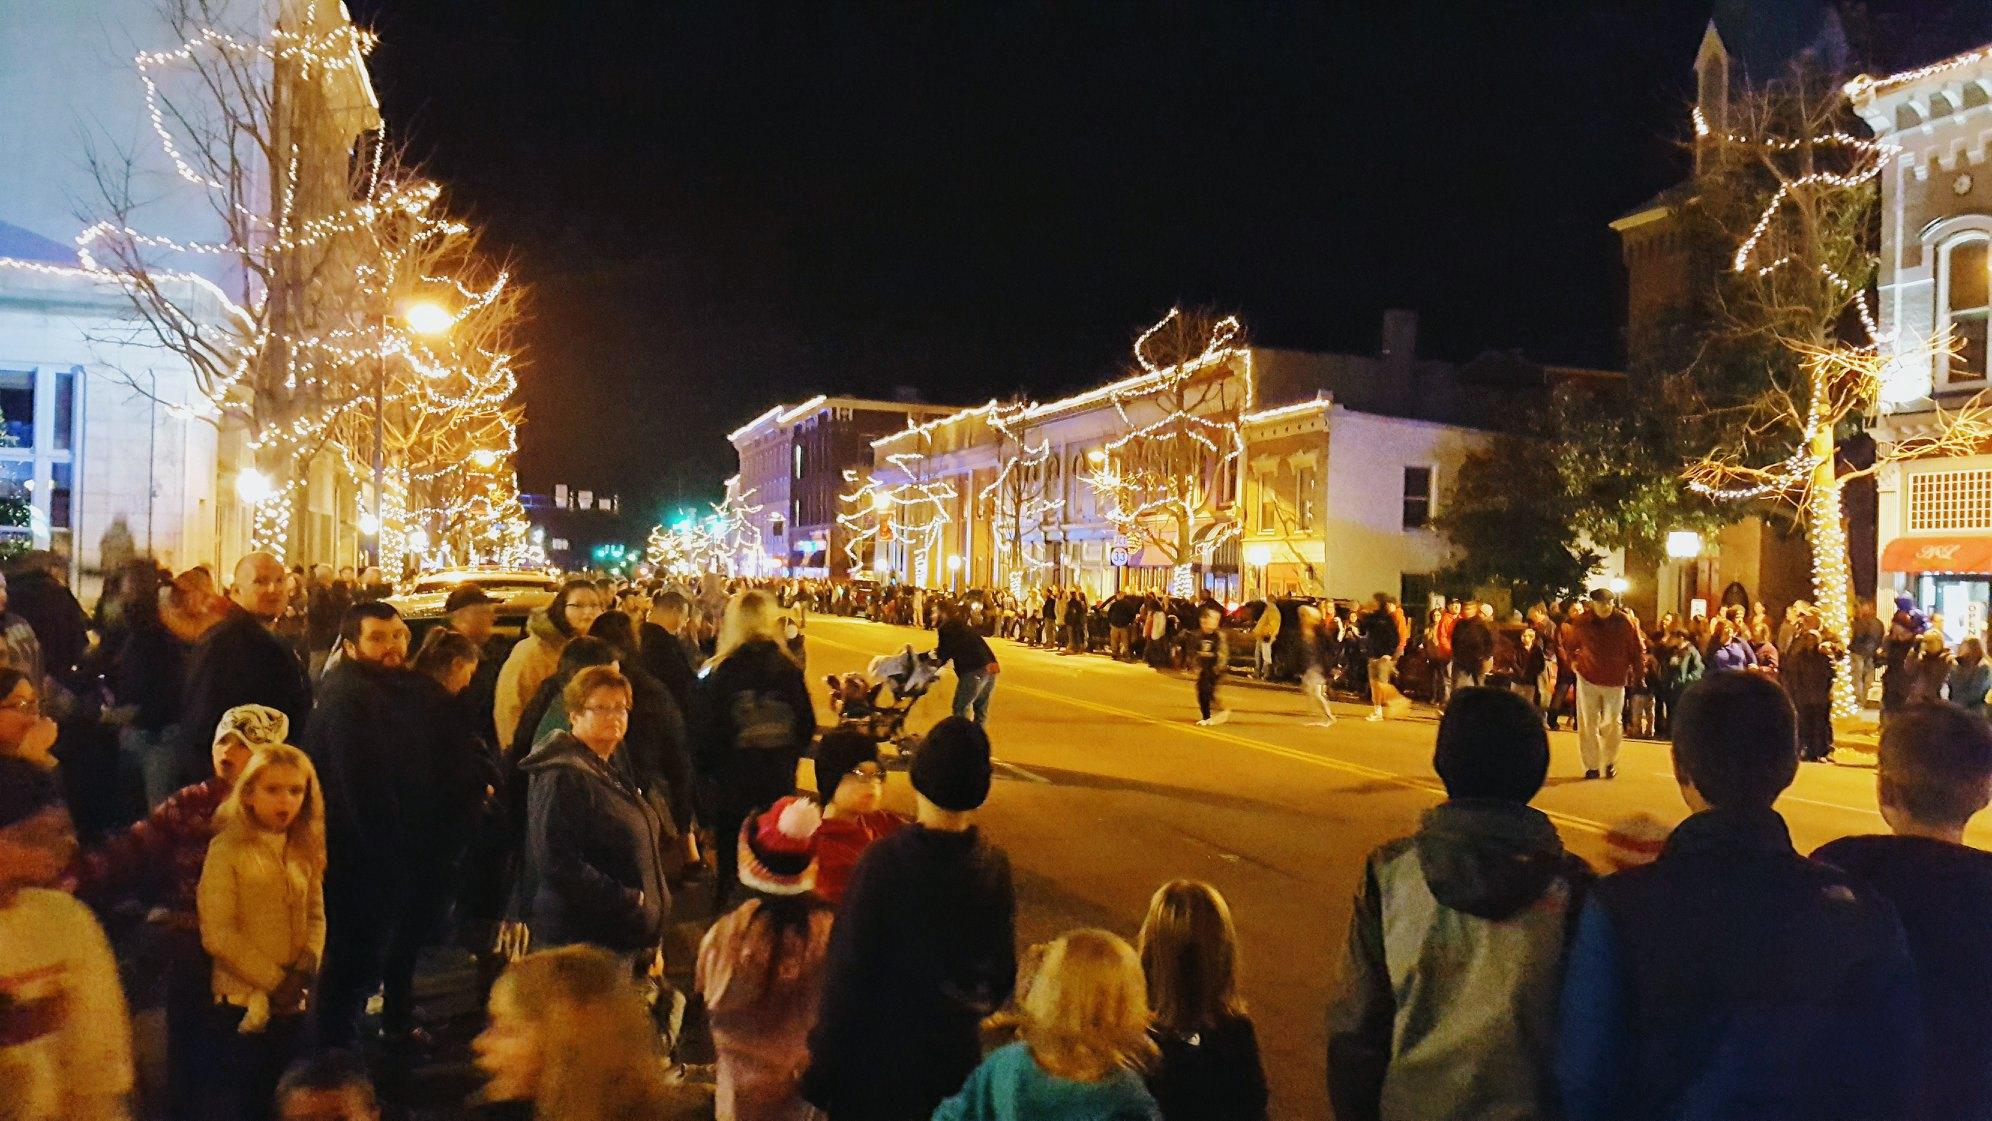 Danville Ky Christmas Parade 2020 2019 Danville Christmas Tree Lighting and Parade   Kentucky Living